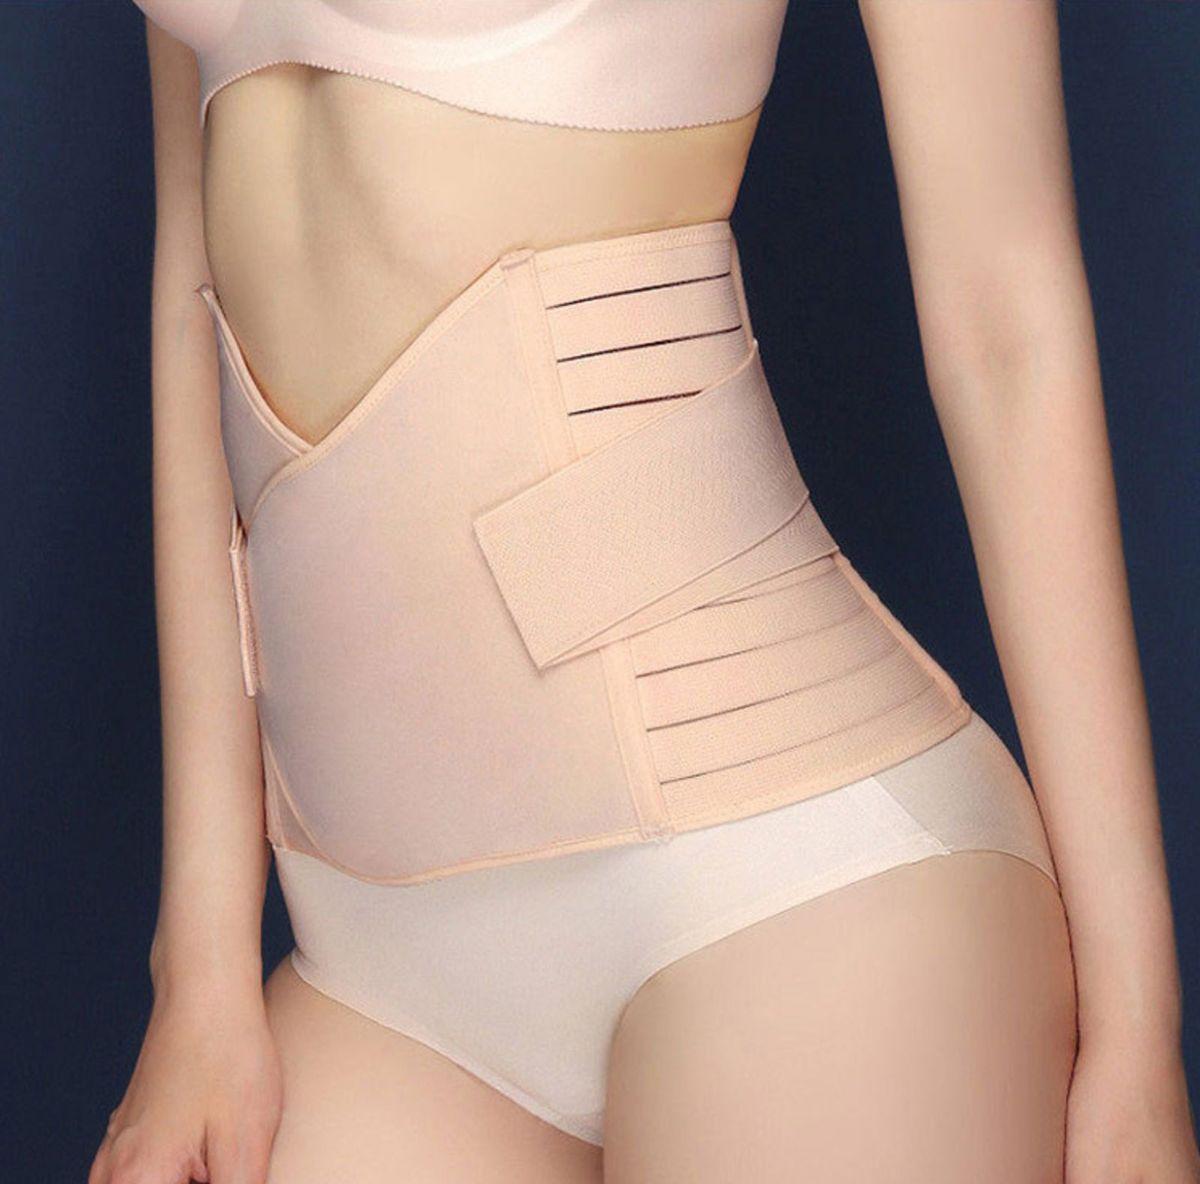 030834259 cinta modeladora faixa abdominal zero barriga afina cintura ortopedica  redutora - cintos sem marca